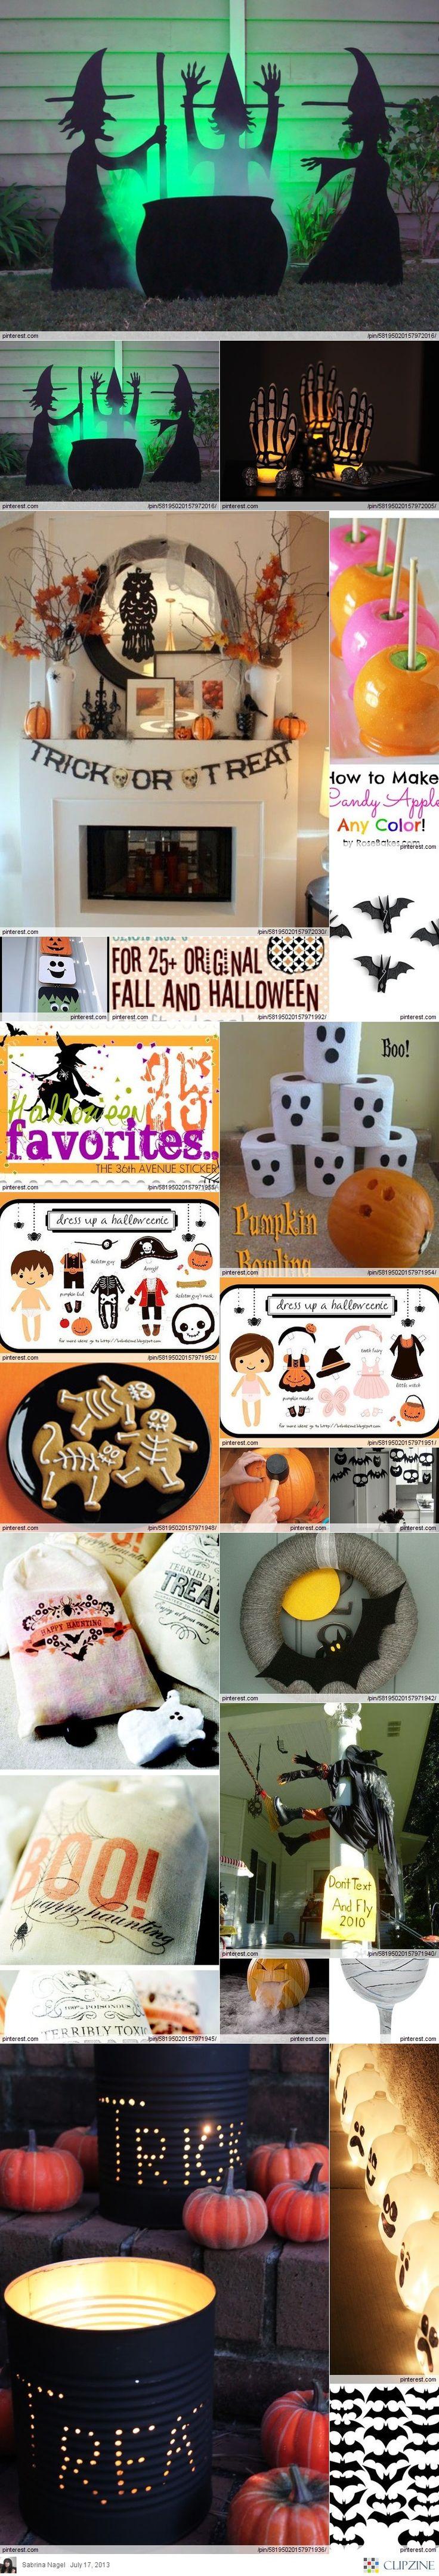 Best 25+ Cool halloween ideas ideas on Pinterest | Cool halloween ...